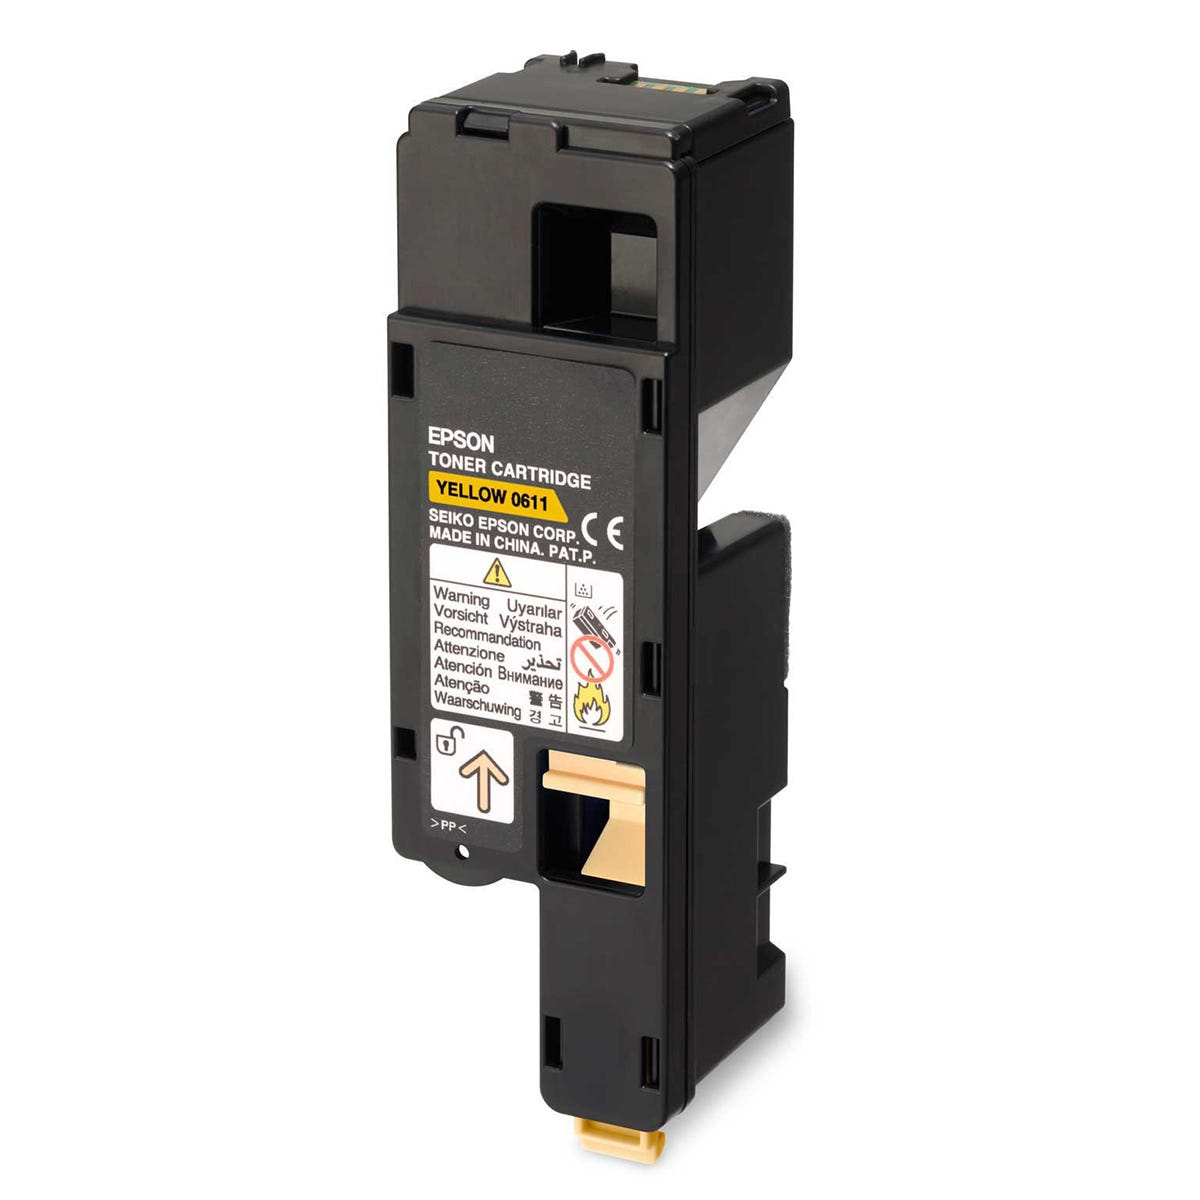 Epson Aculaser C1700 Toner Cartridge High Yield, Yellow.